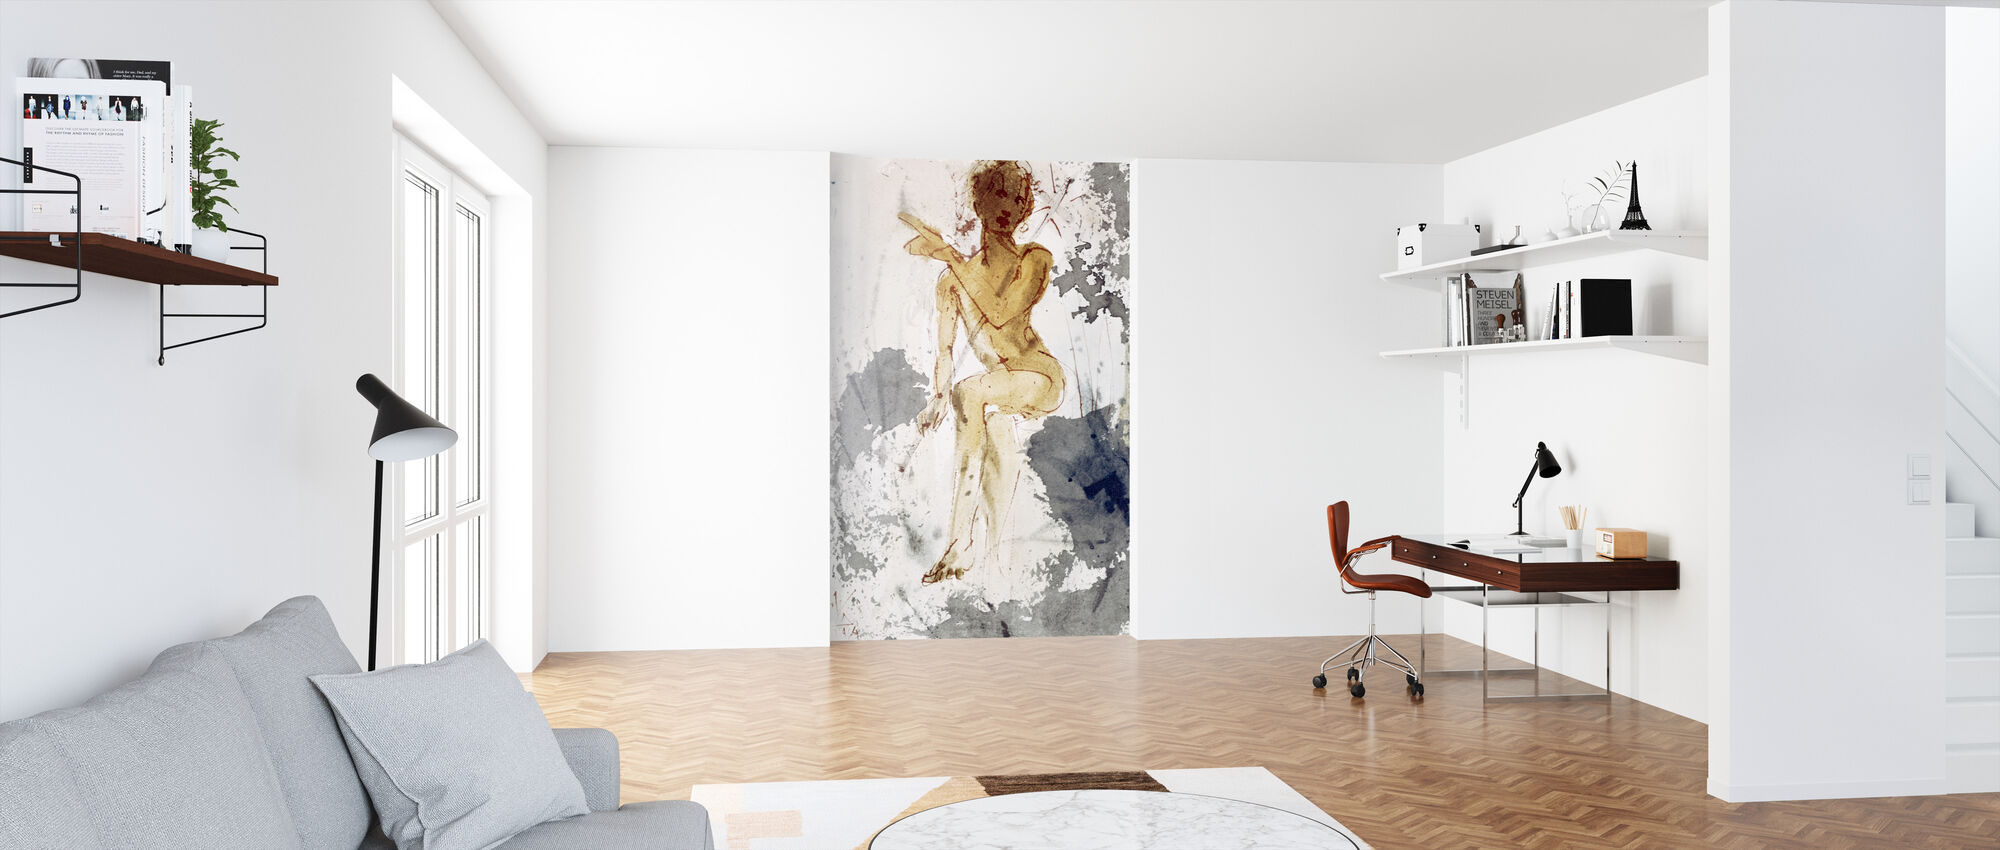 Saint John the Baptist - Salvador Dali - Wallpaper - Office